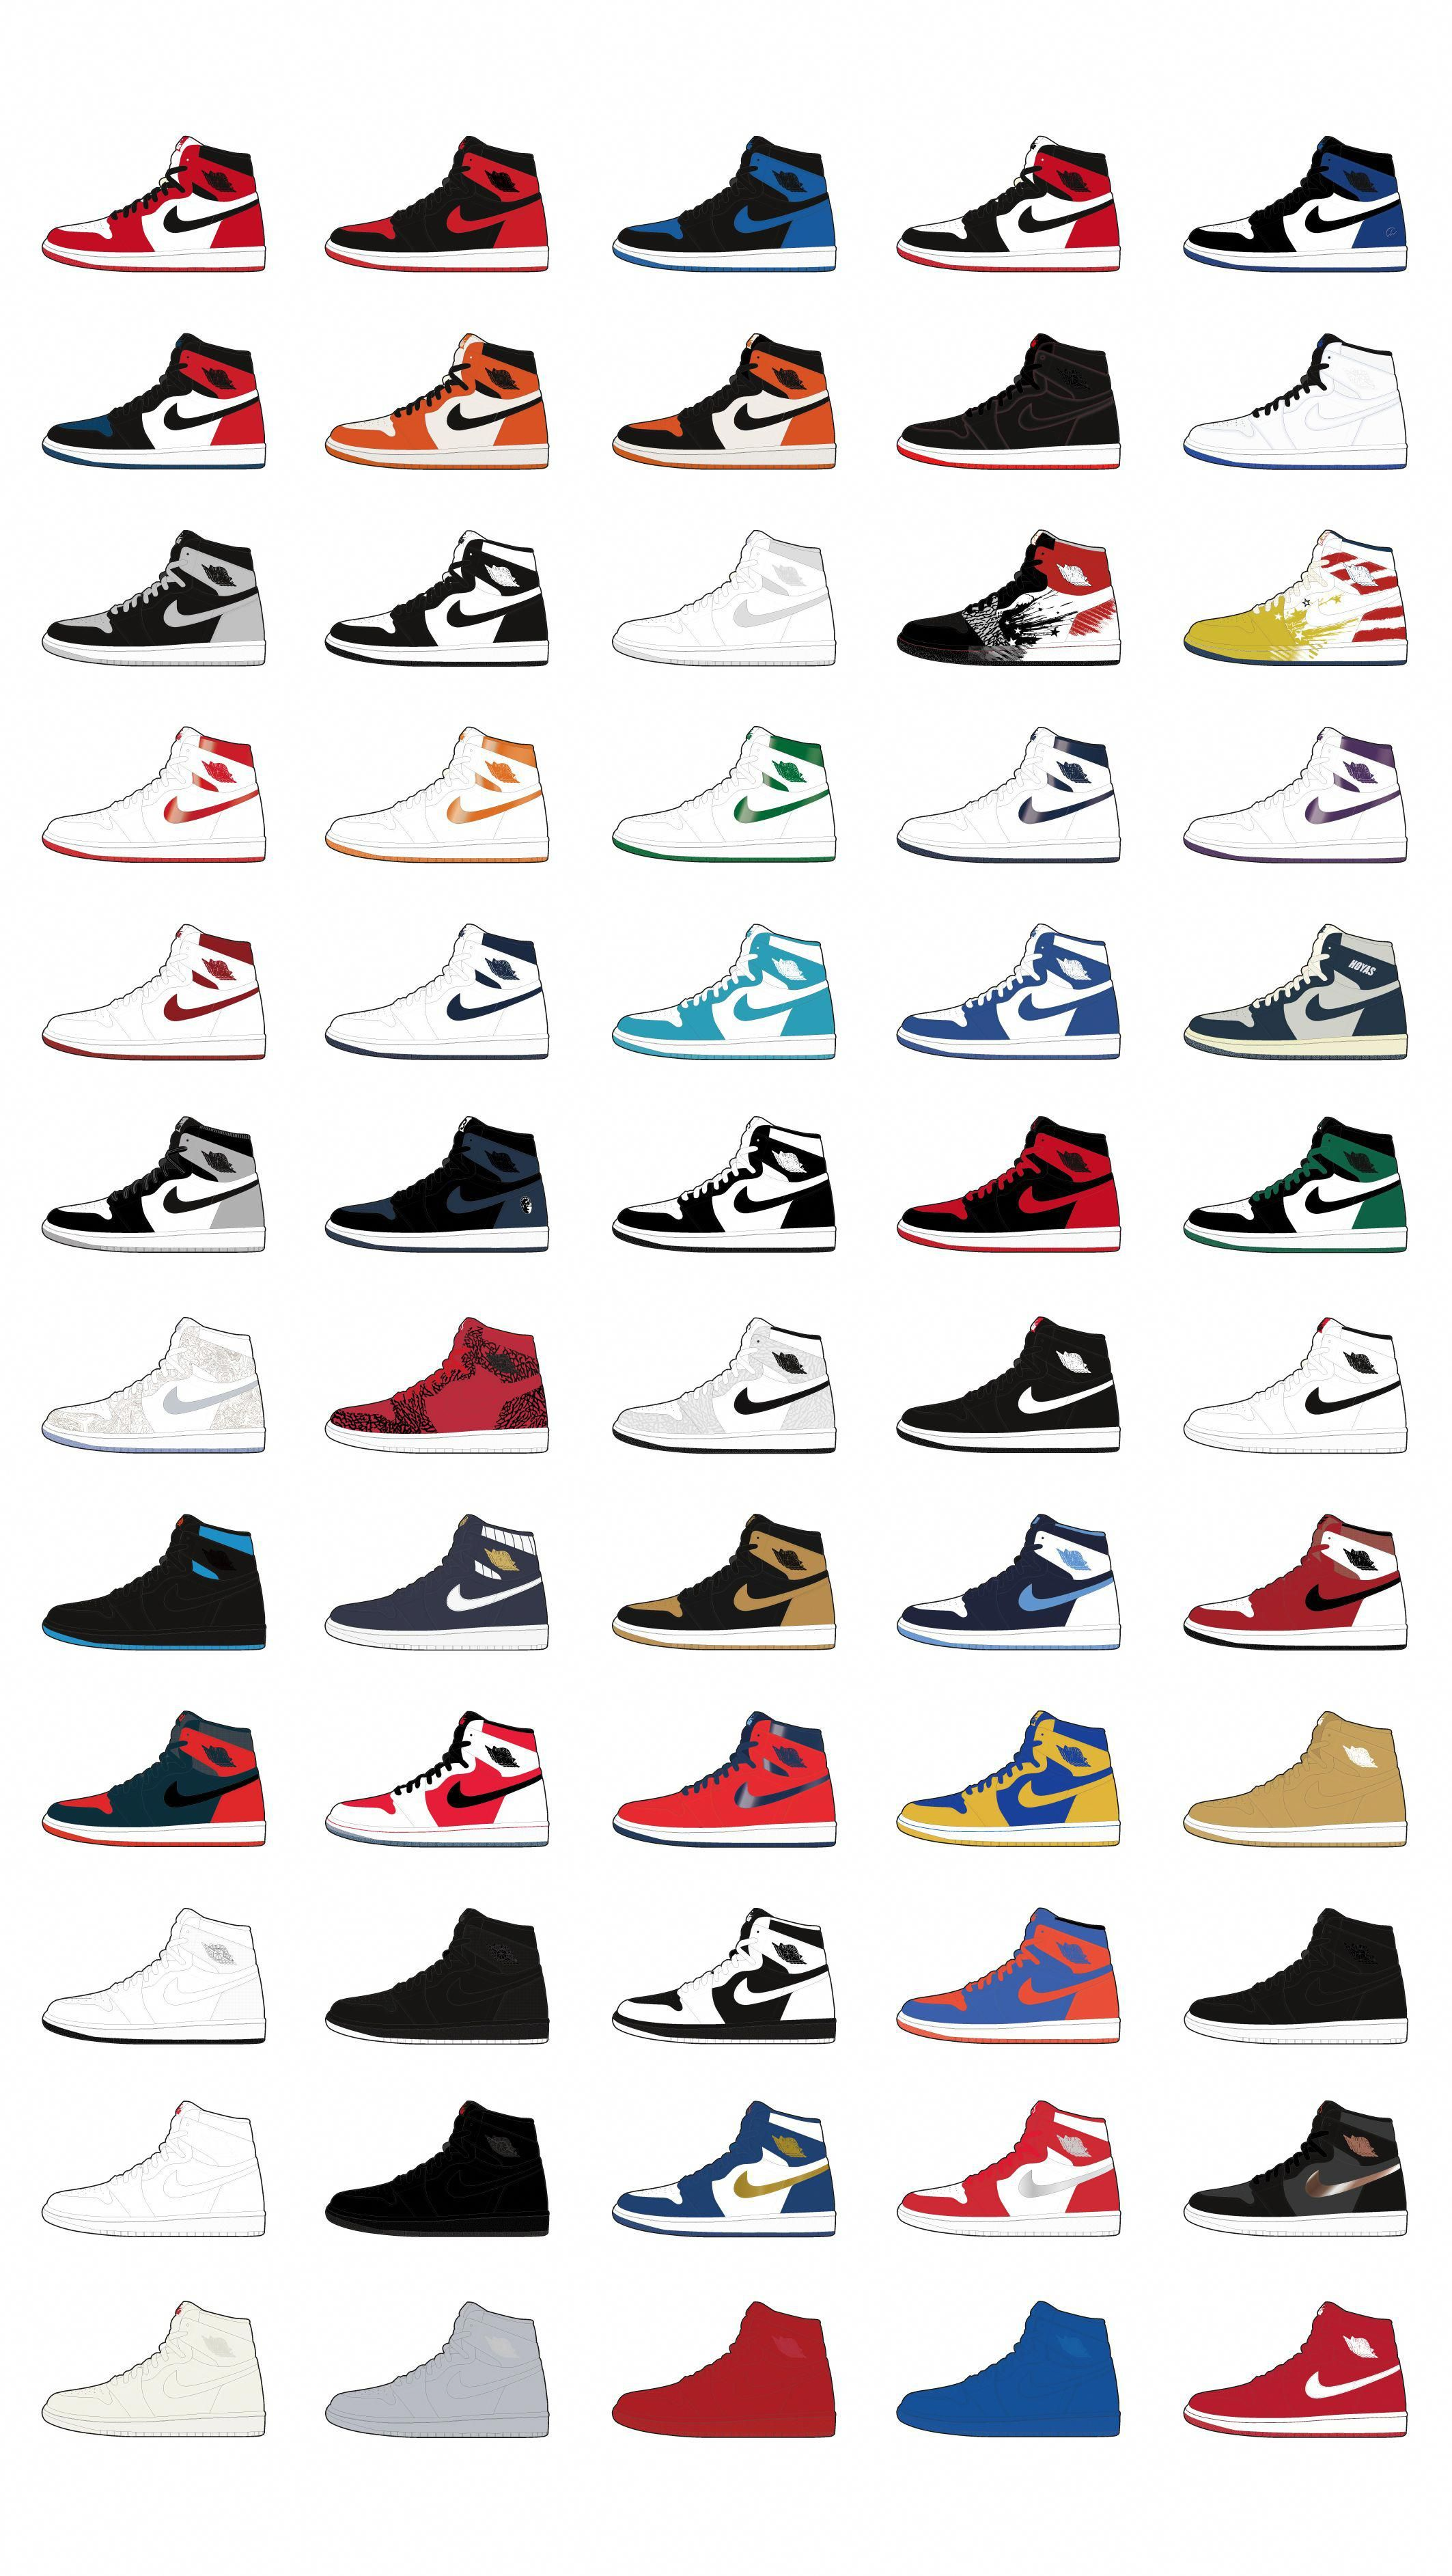 every type of jordan shoe